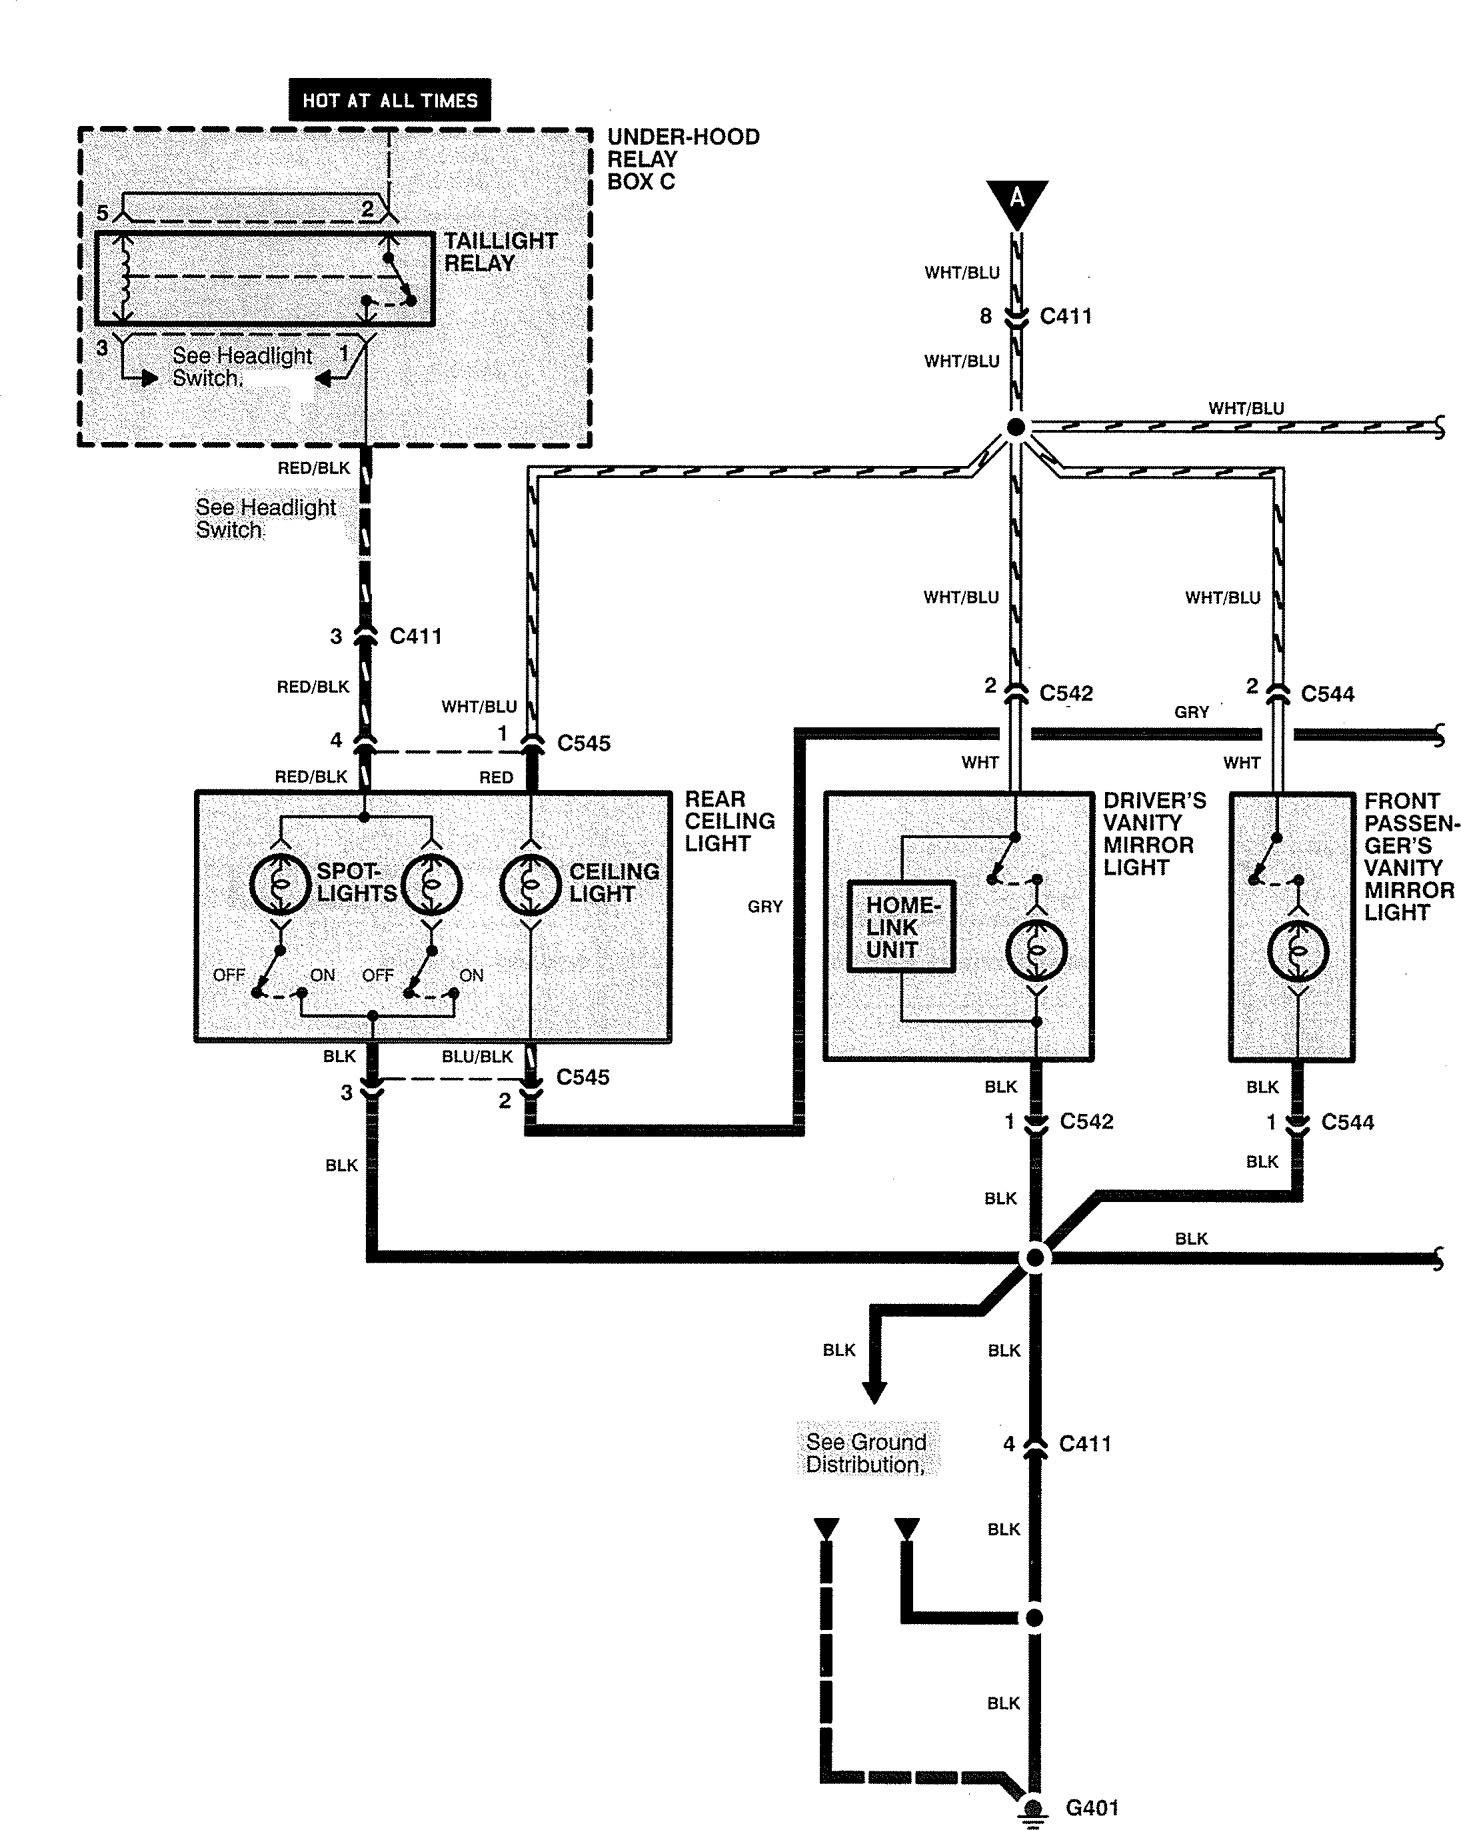 Acura Rl  1999  - Wiring Diagrams